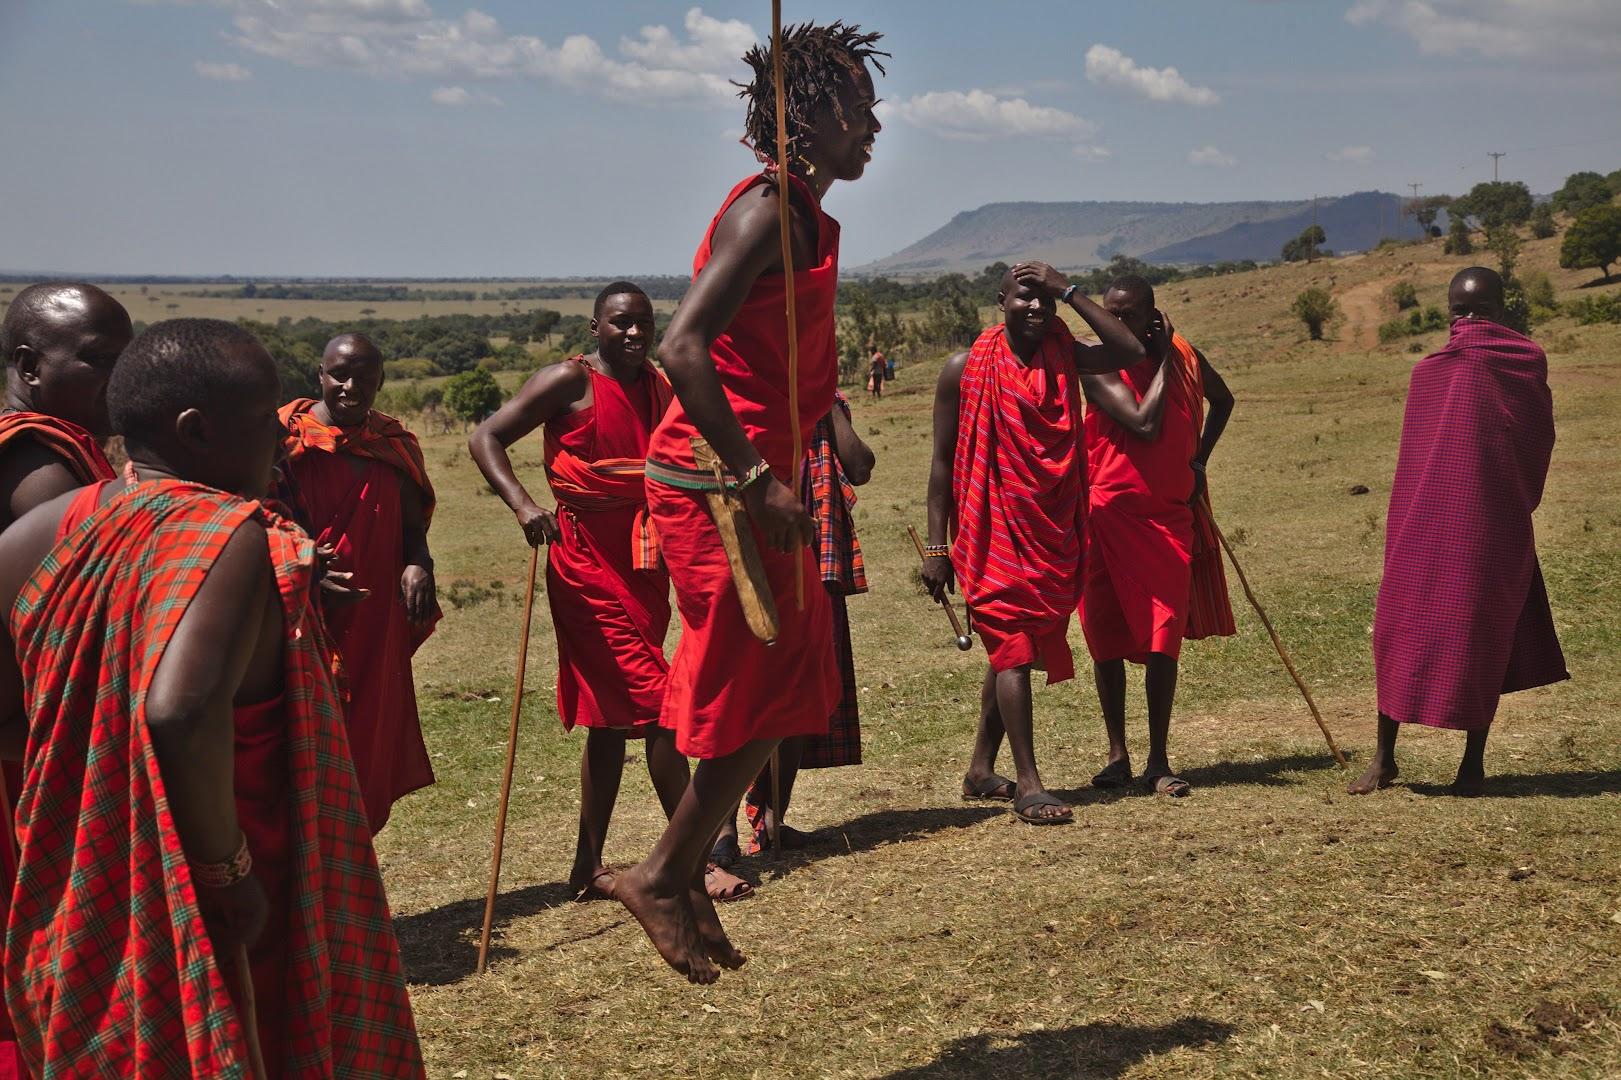 Traditional Masai jumping-dance